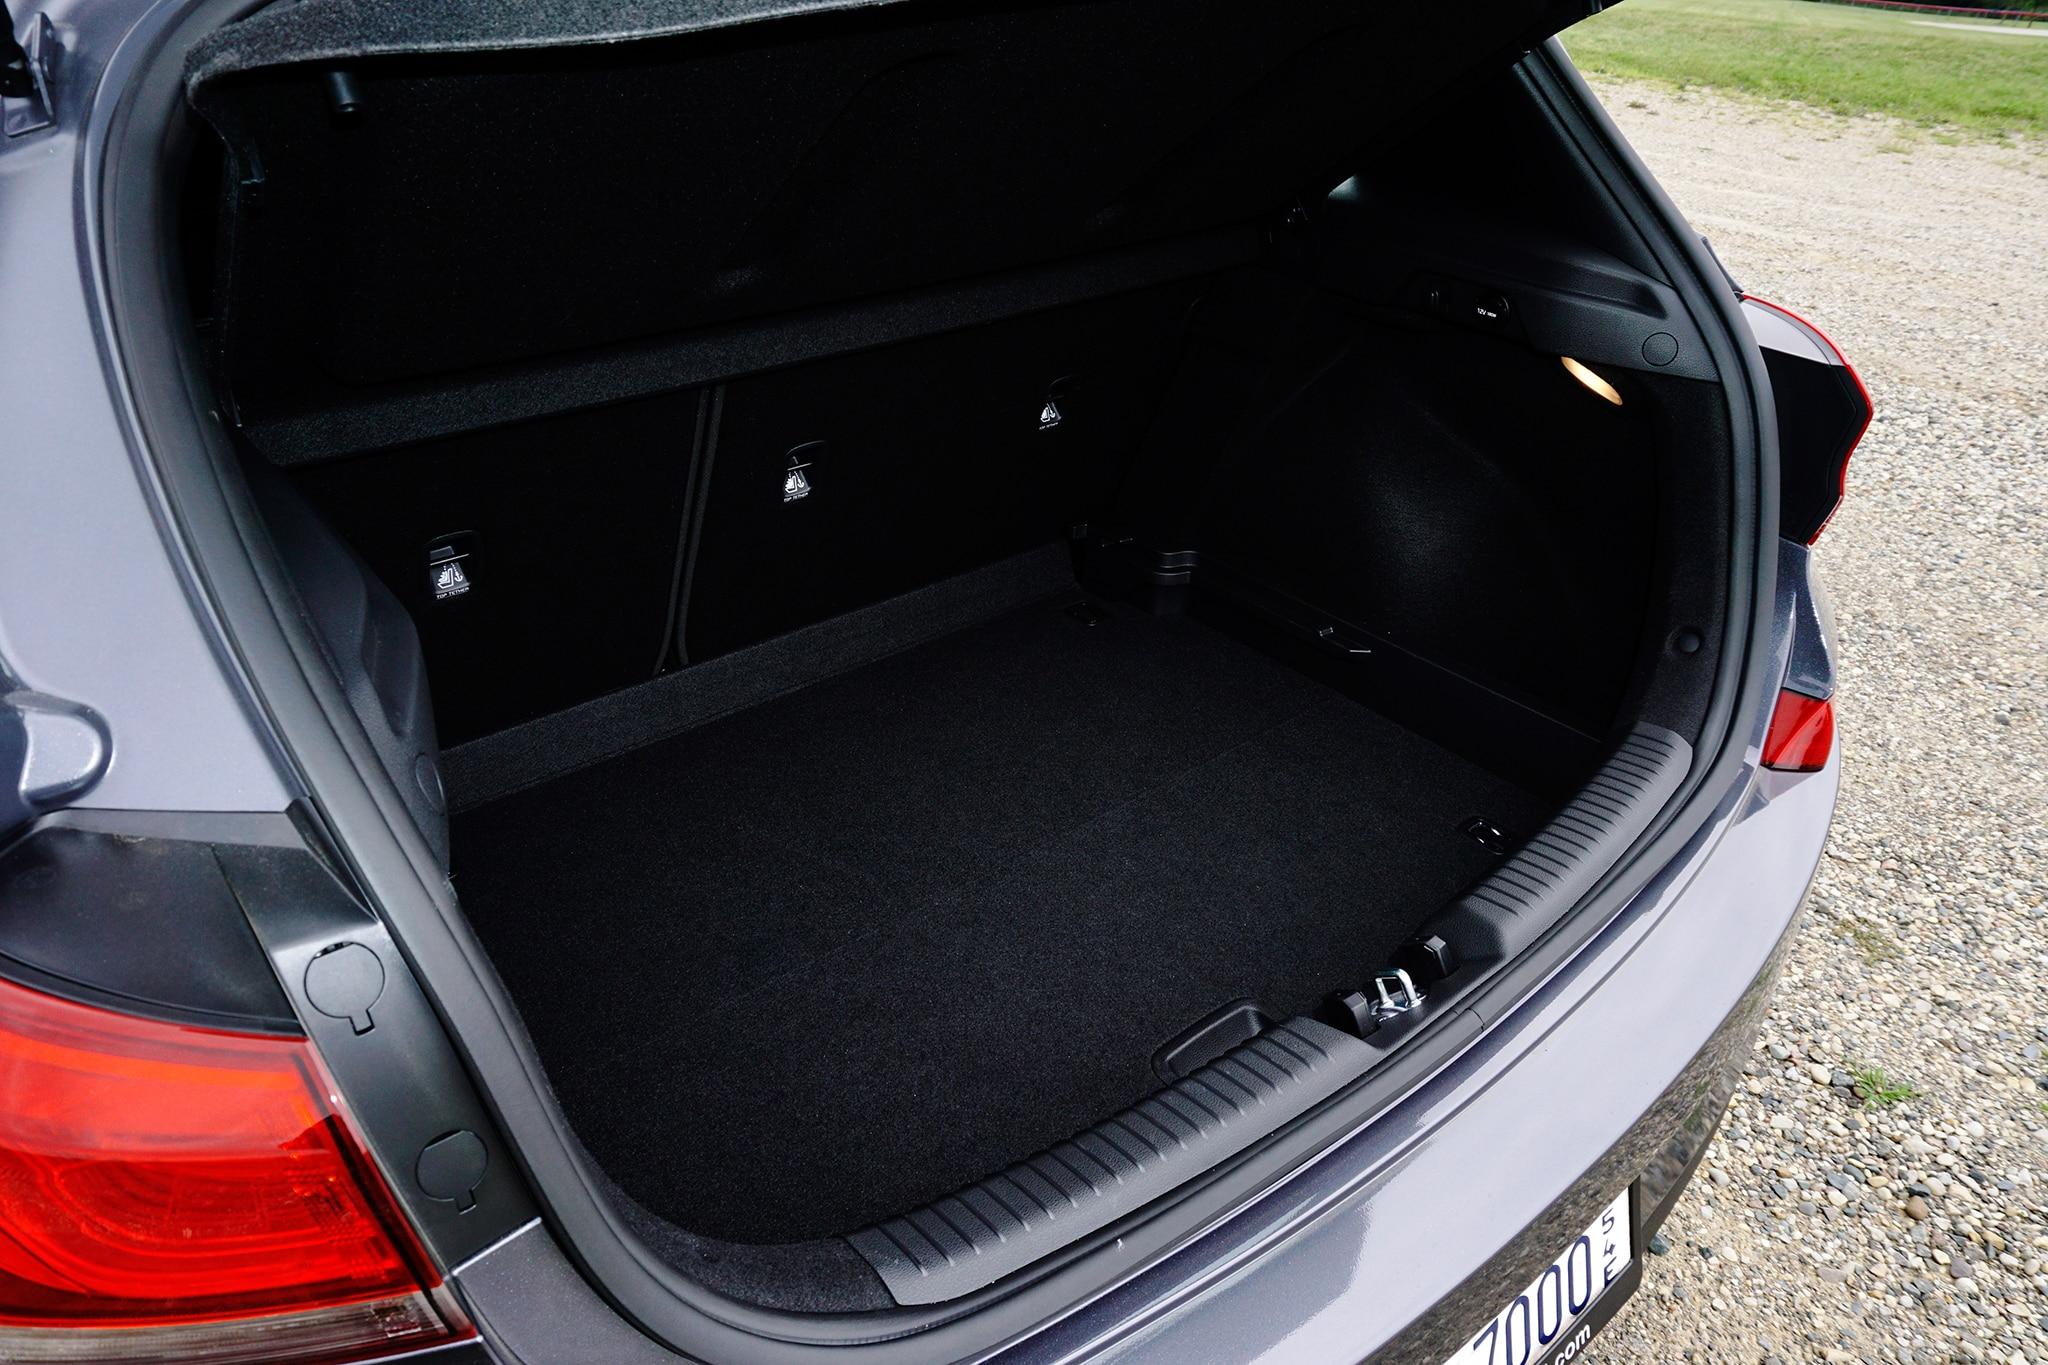 2018-Hyundai-Elantra-GT-cargo-space.jpg